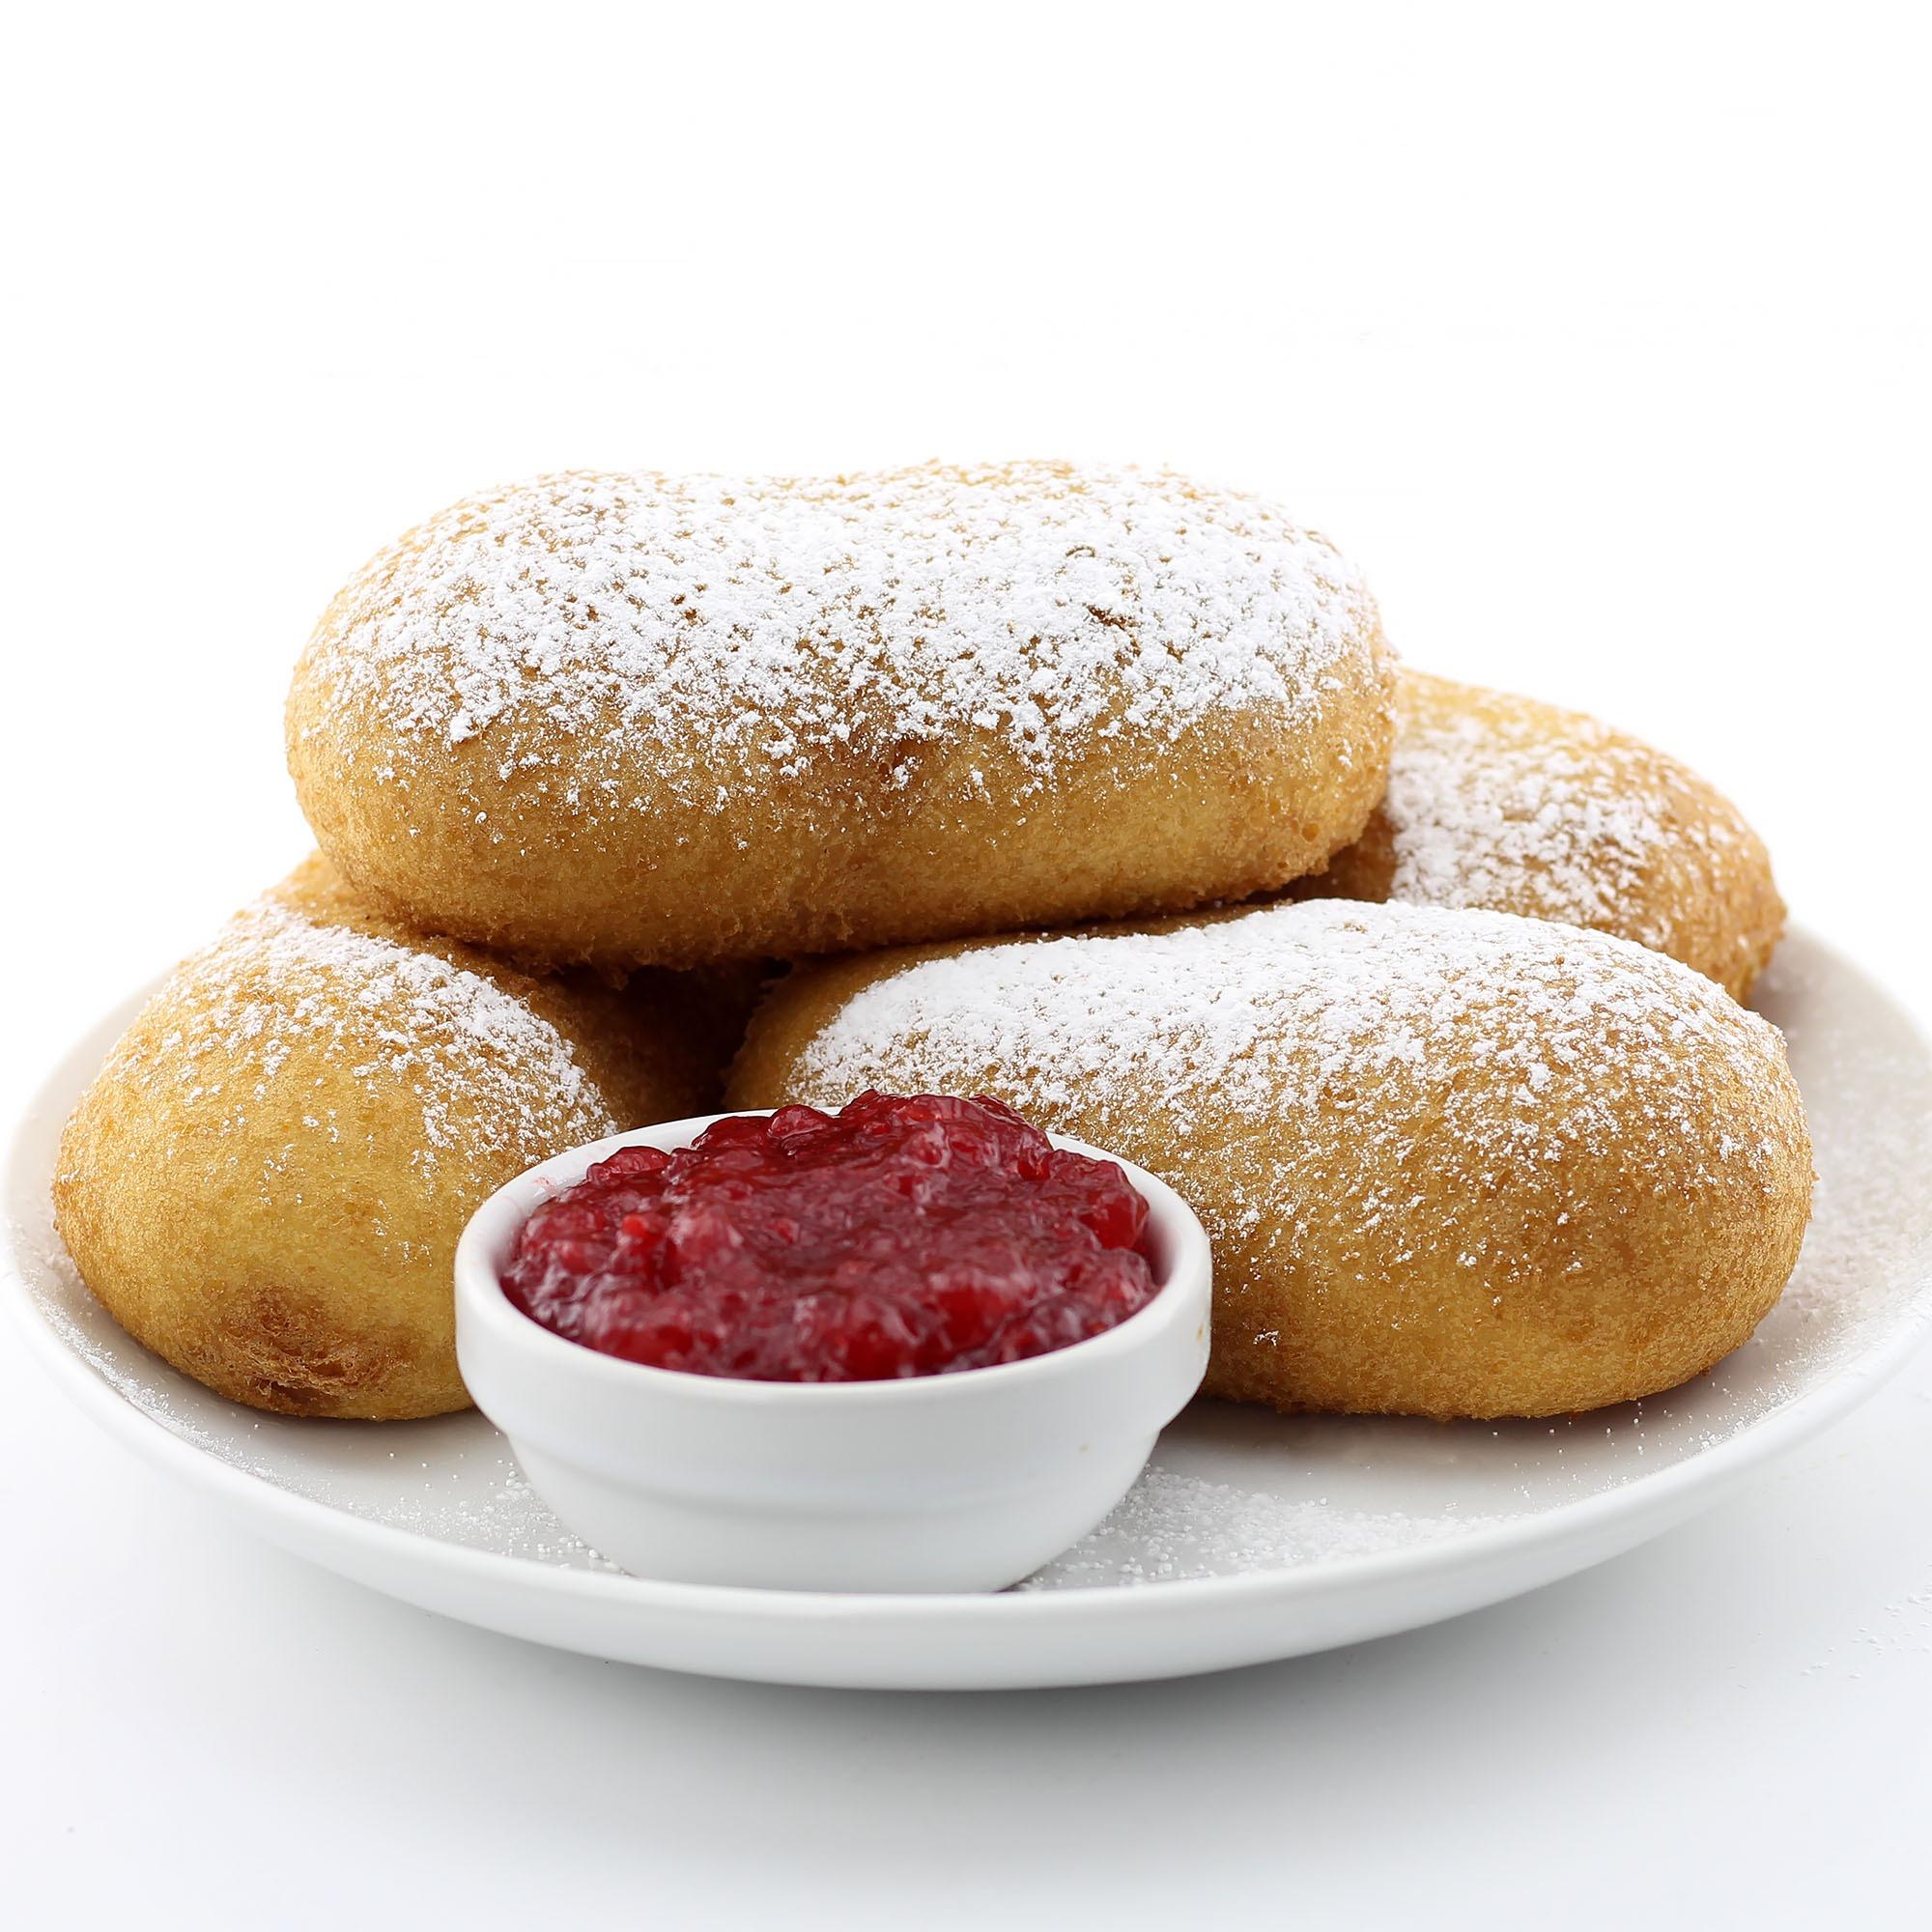 Fried Twinkies